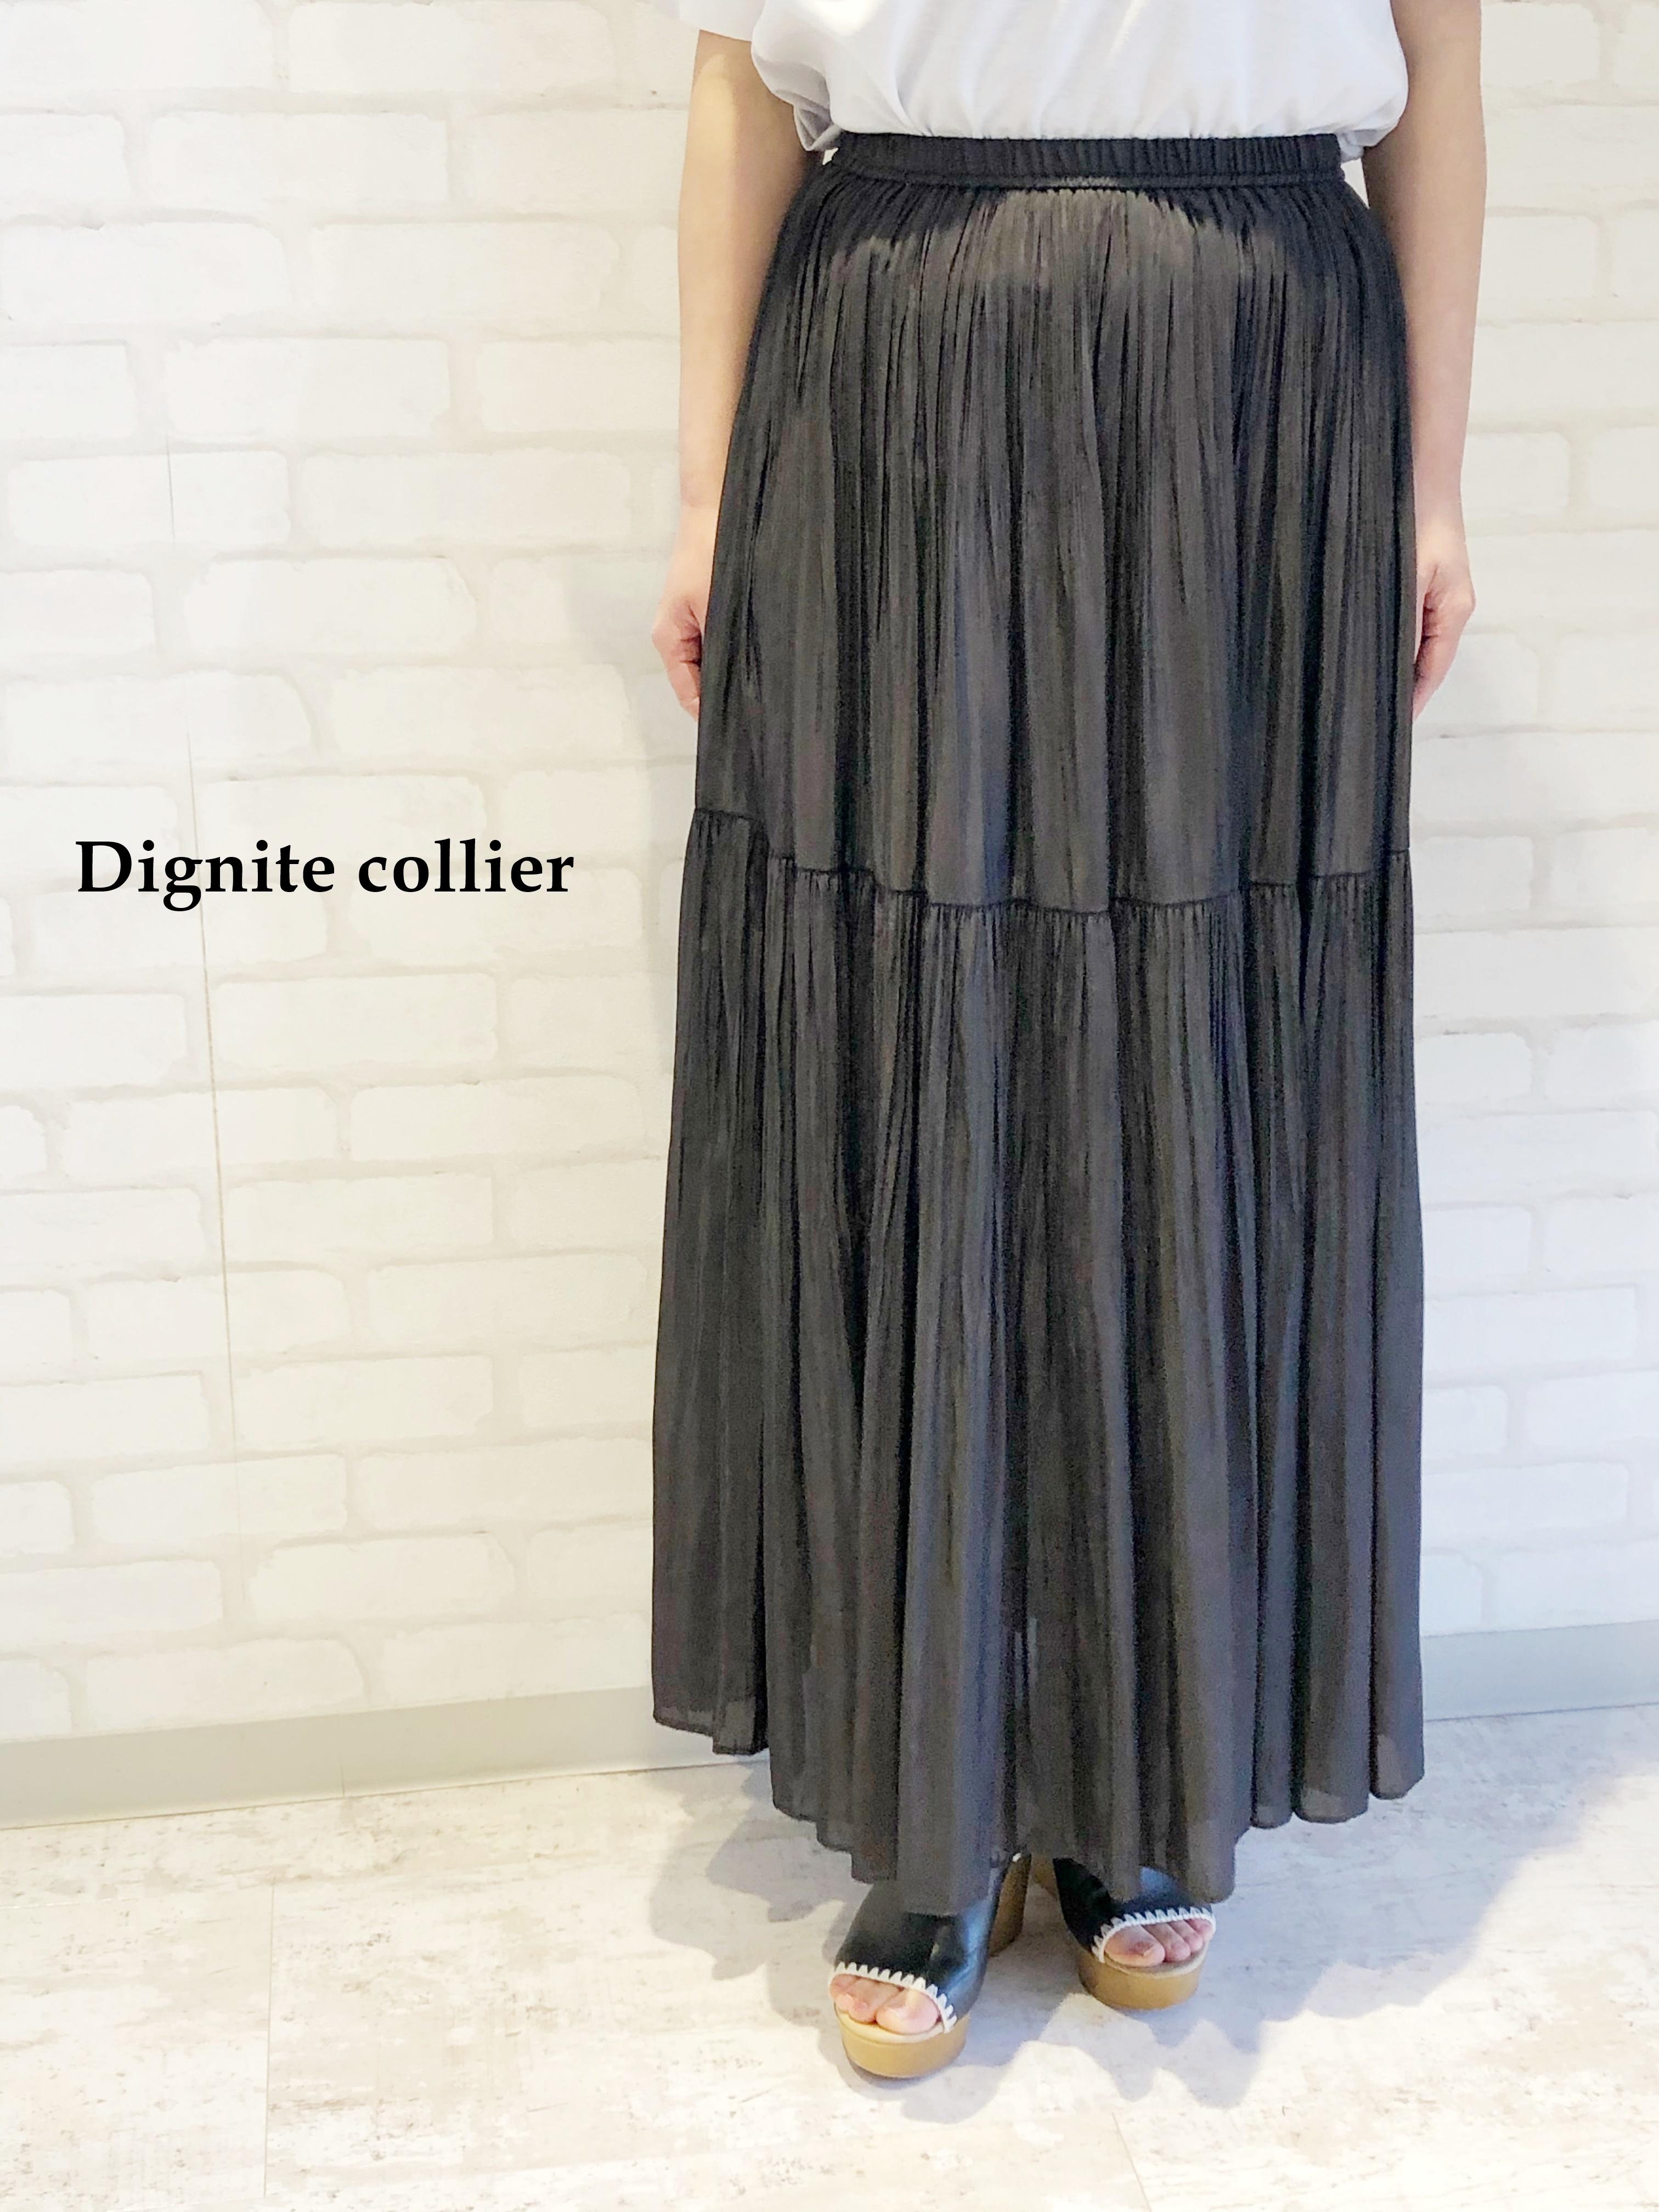 Dignite Collier/2段ランダムプリーツロングスカート/802006(ブラック)